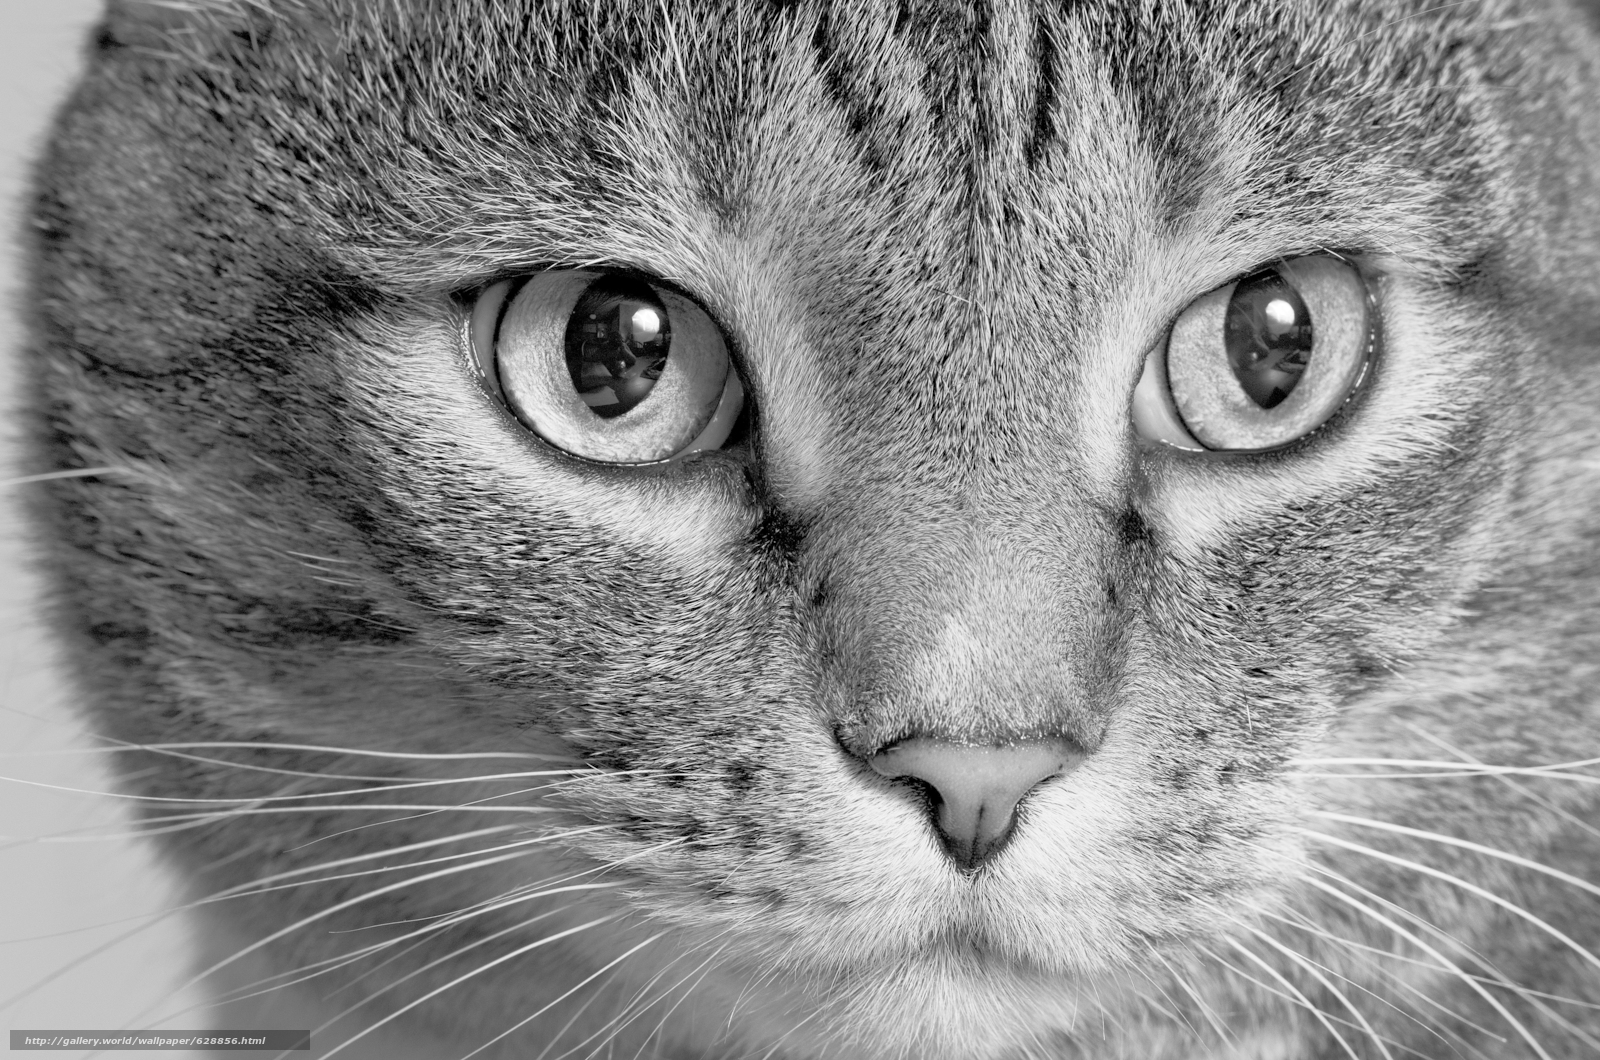 кот, кошка, морда, взгляд, монохром, чёрно-белая